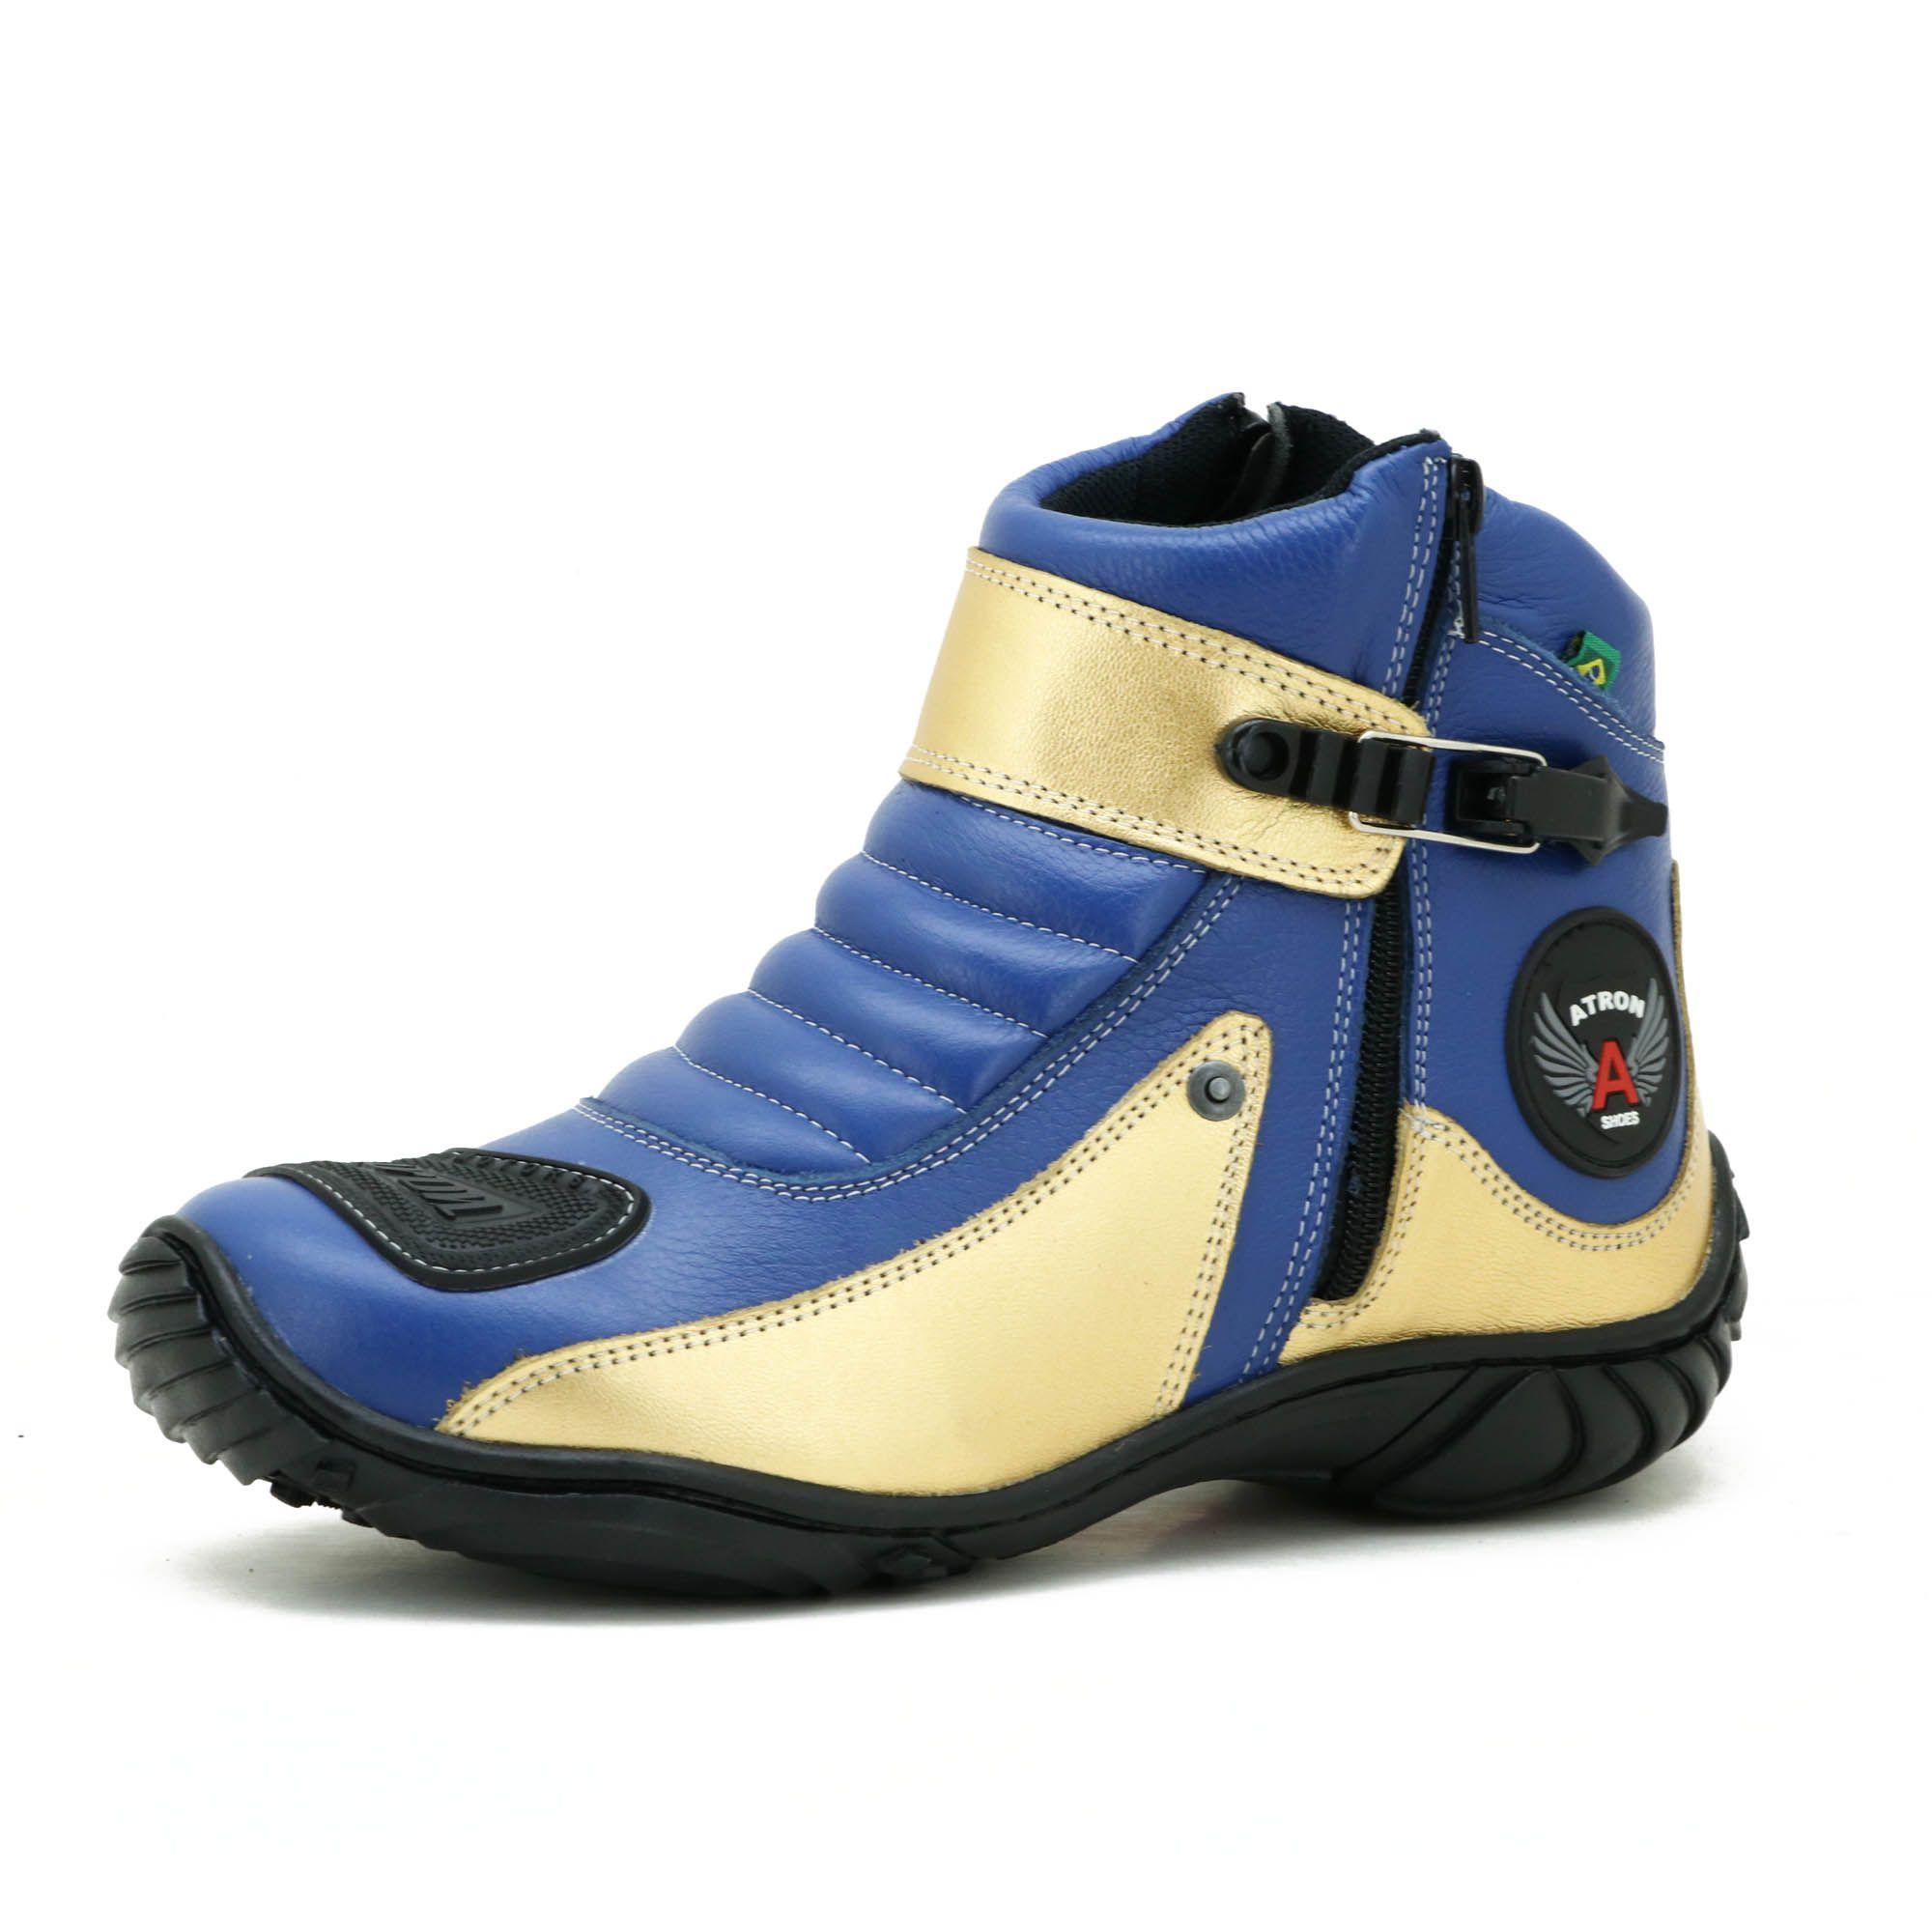 Bota motociclista azul e dourada Atron Shoes 271